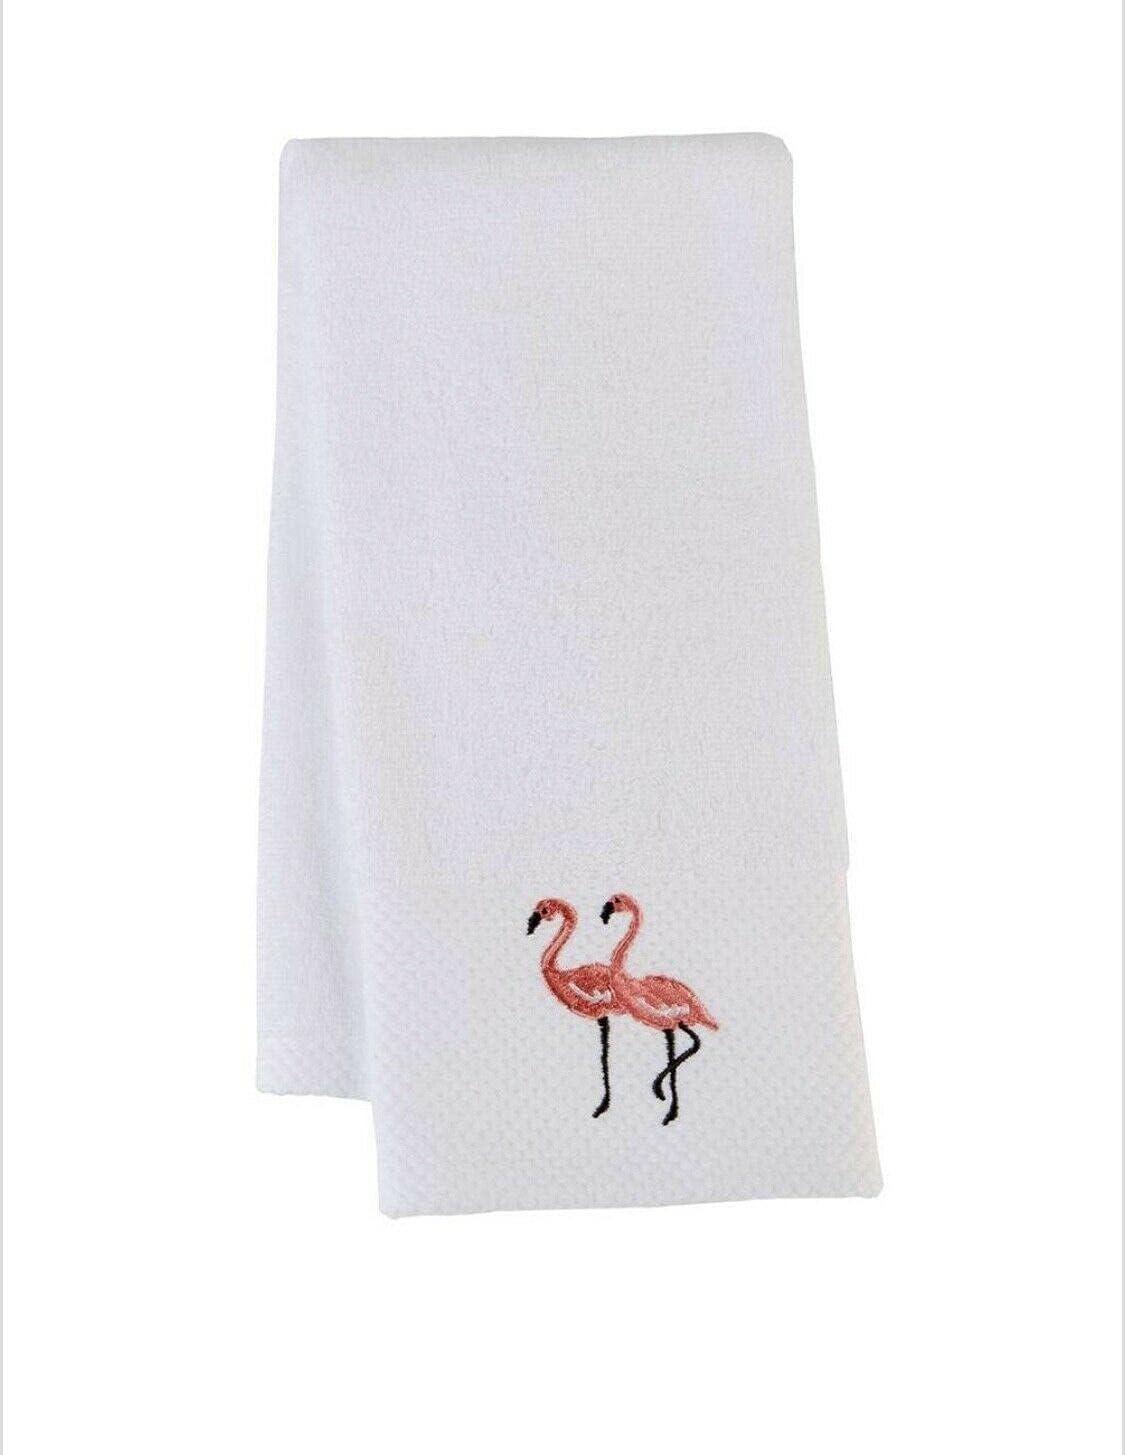 Flamingo Embroidered Hand Towels Set 2 of Beach Elegant Tow San Antonio Mall Summer